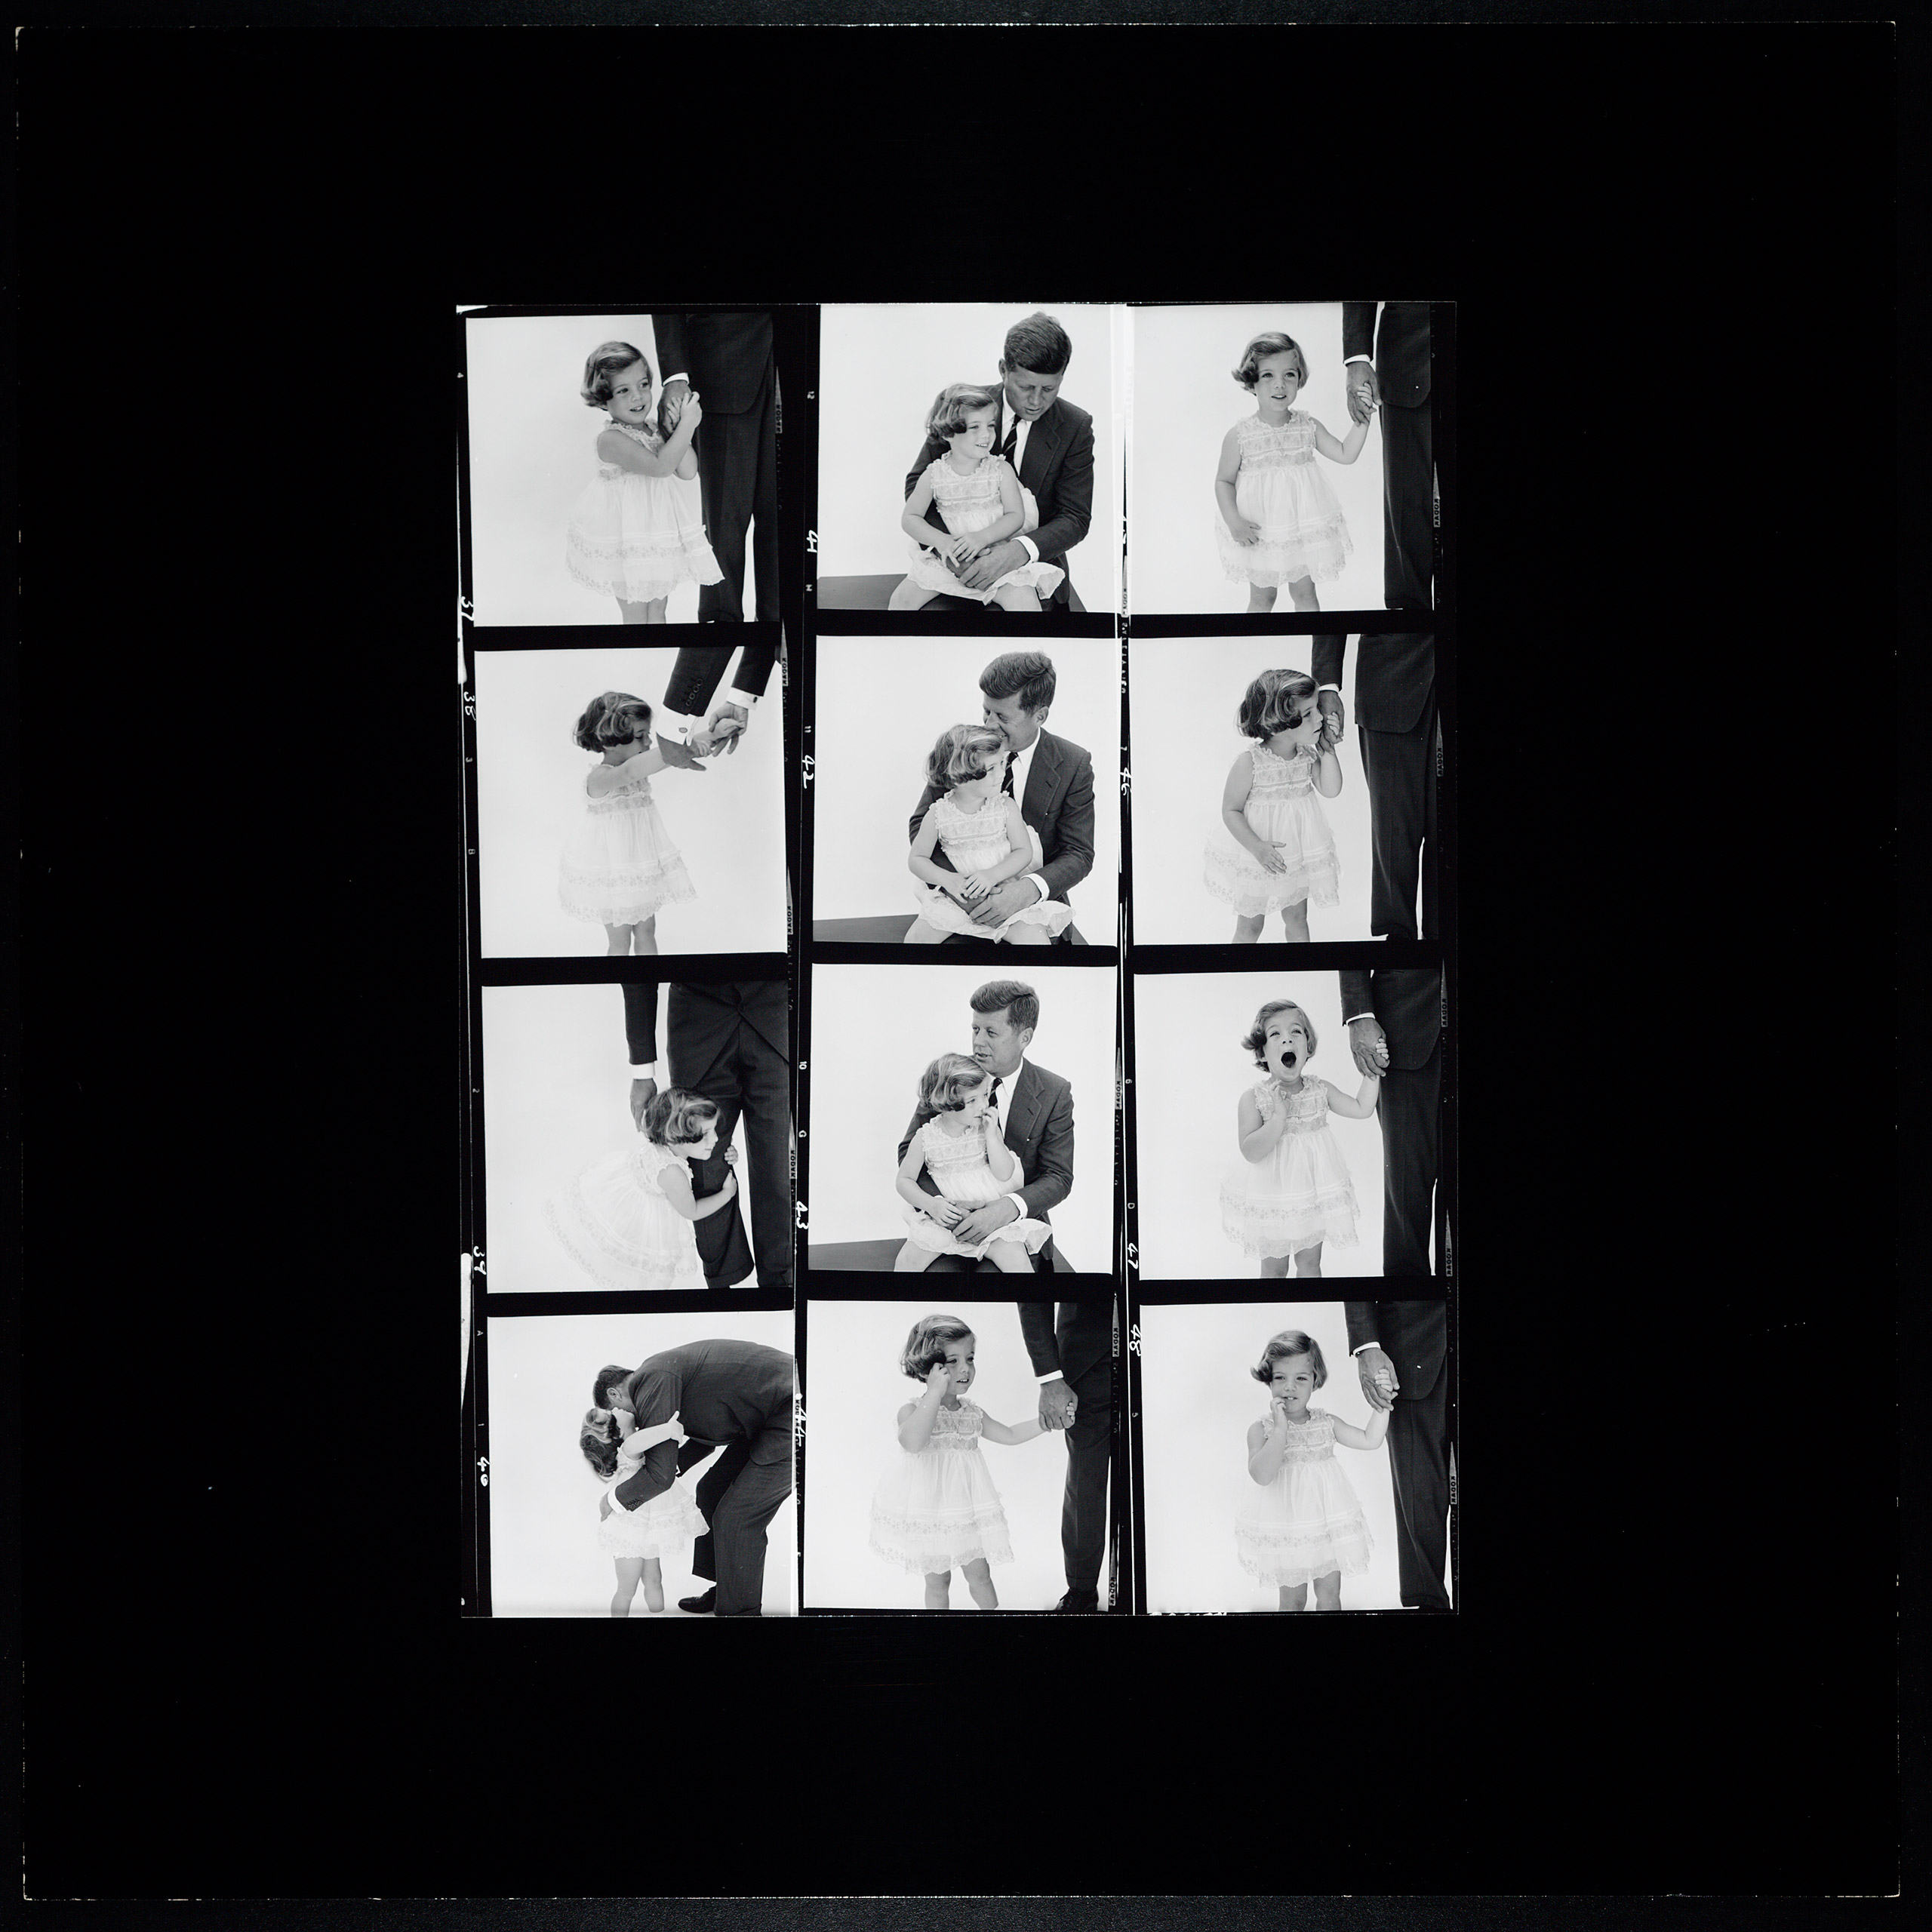 Kennedy family contact sheet by Richard Avedon, 1961.